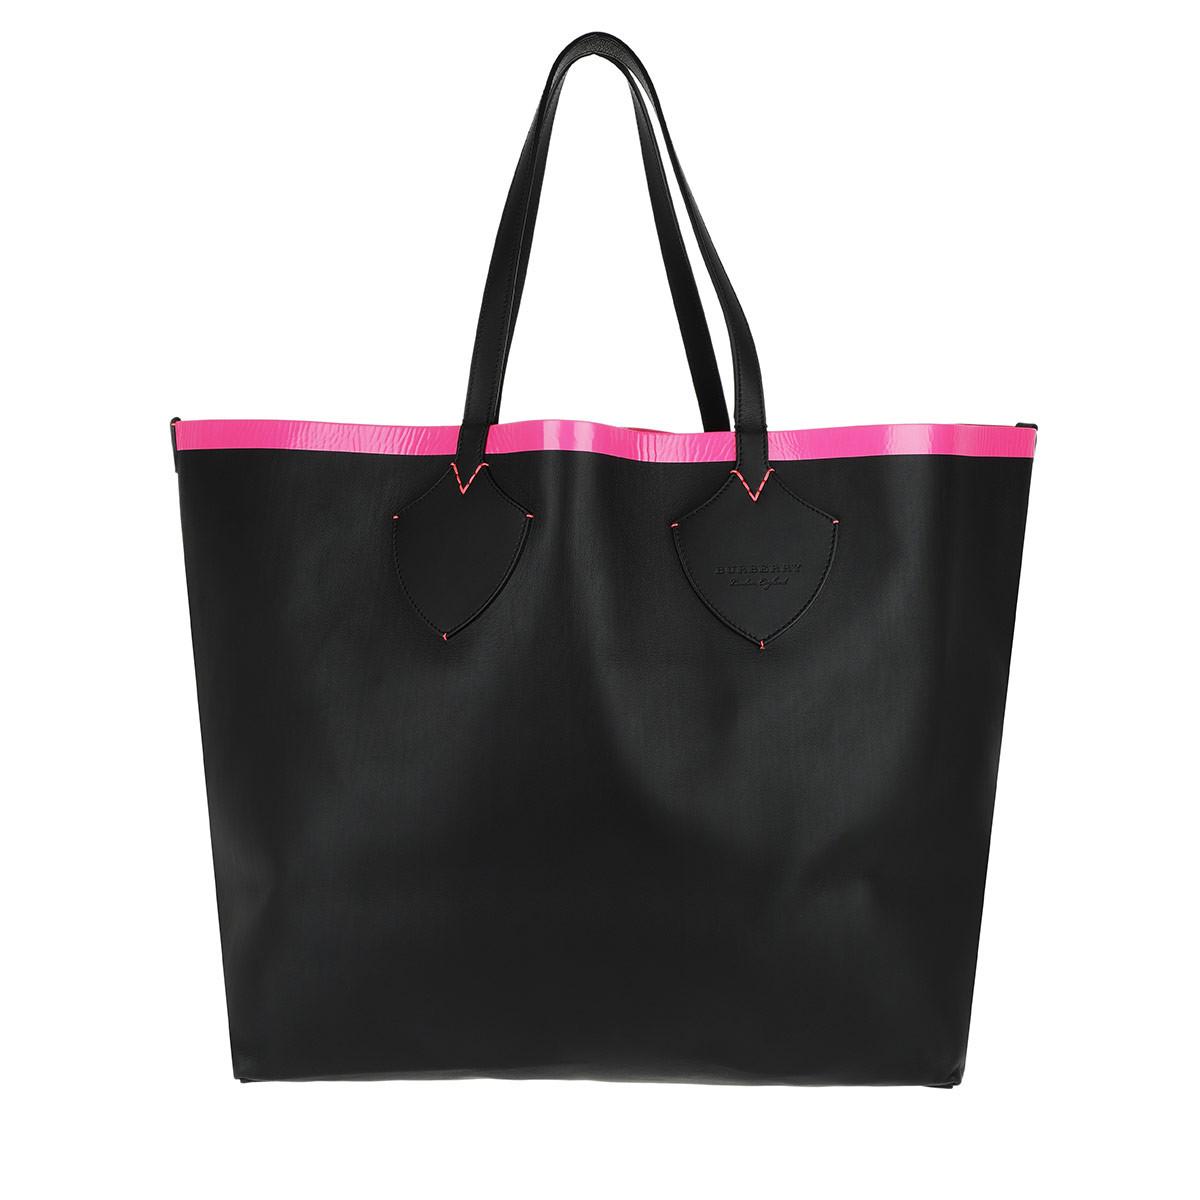 4648a25b7a1 Burberry tassen online kopen | Fashionchick.nl